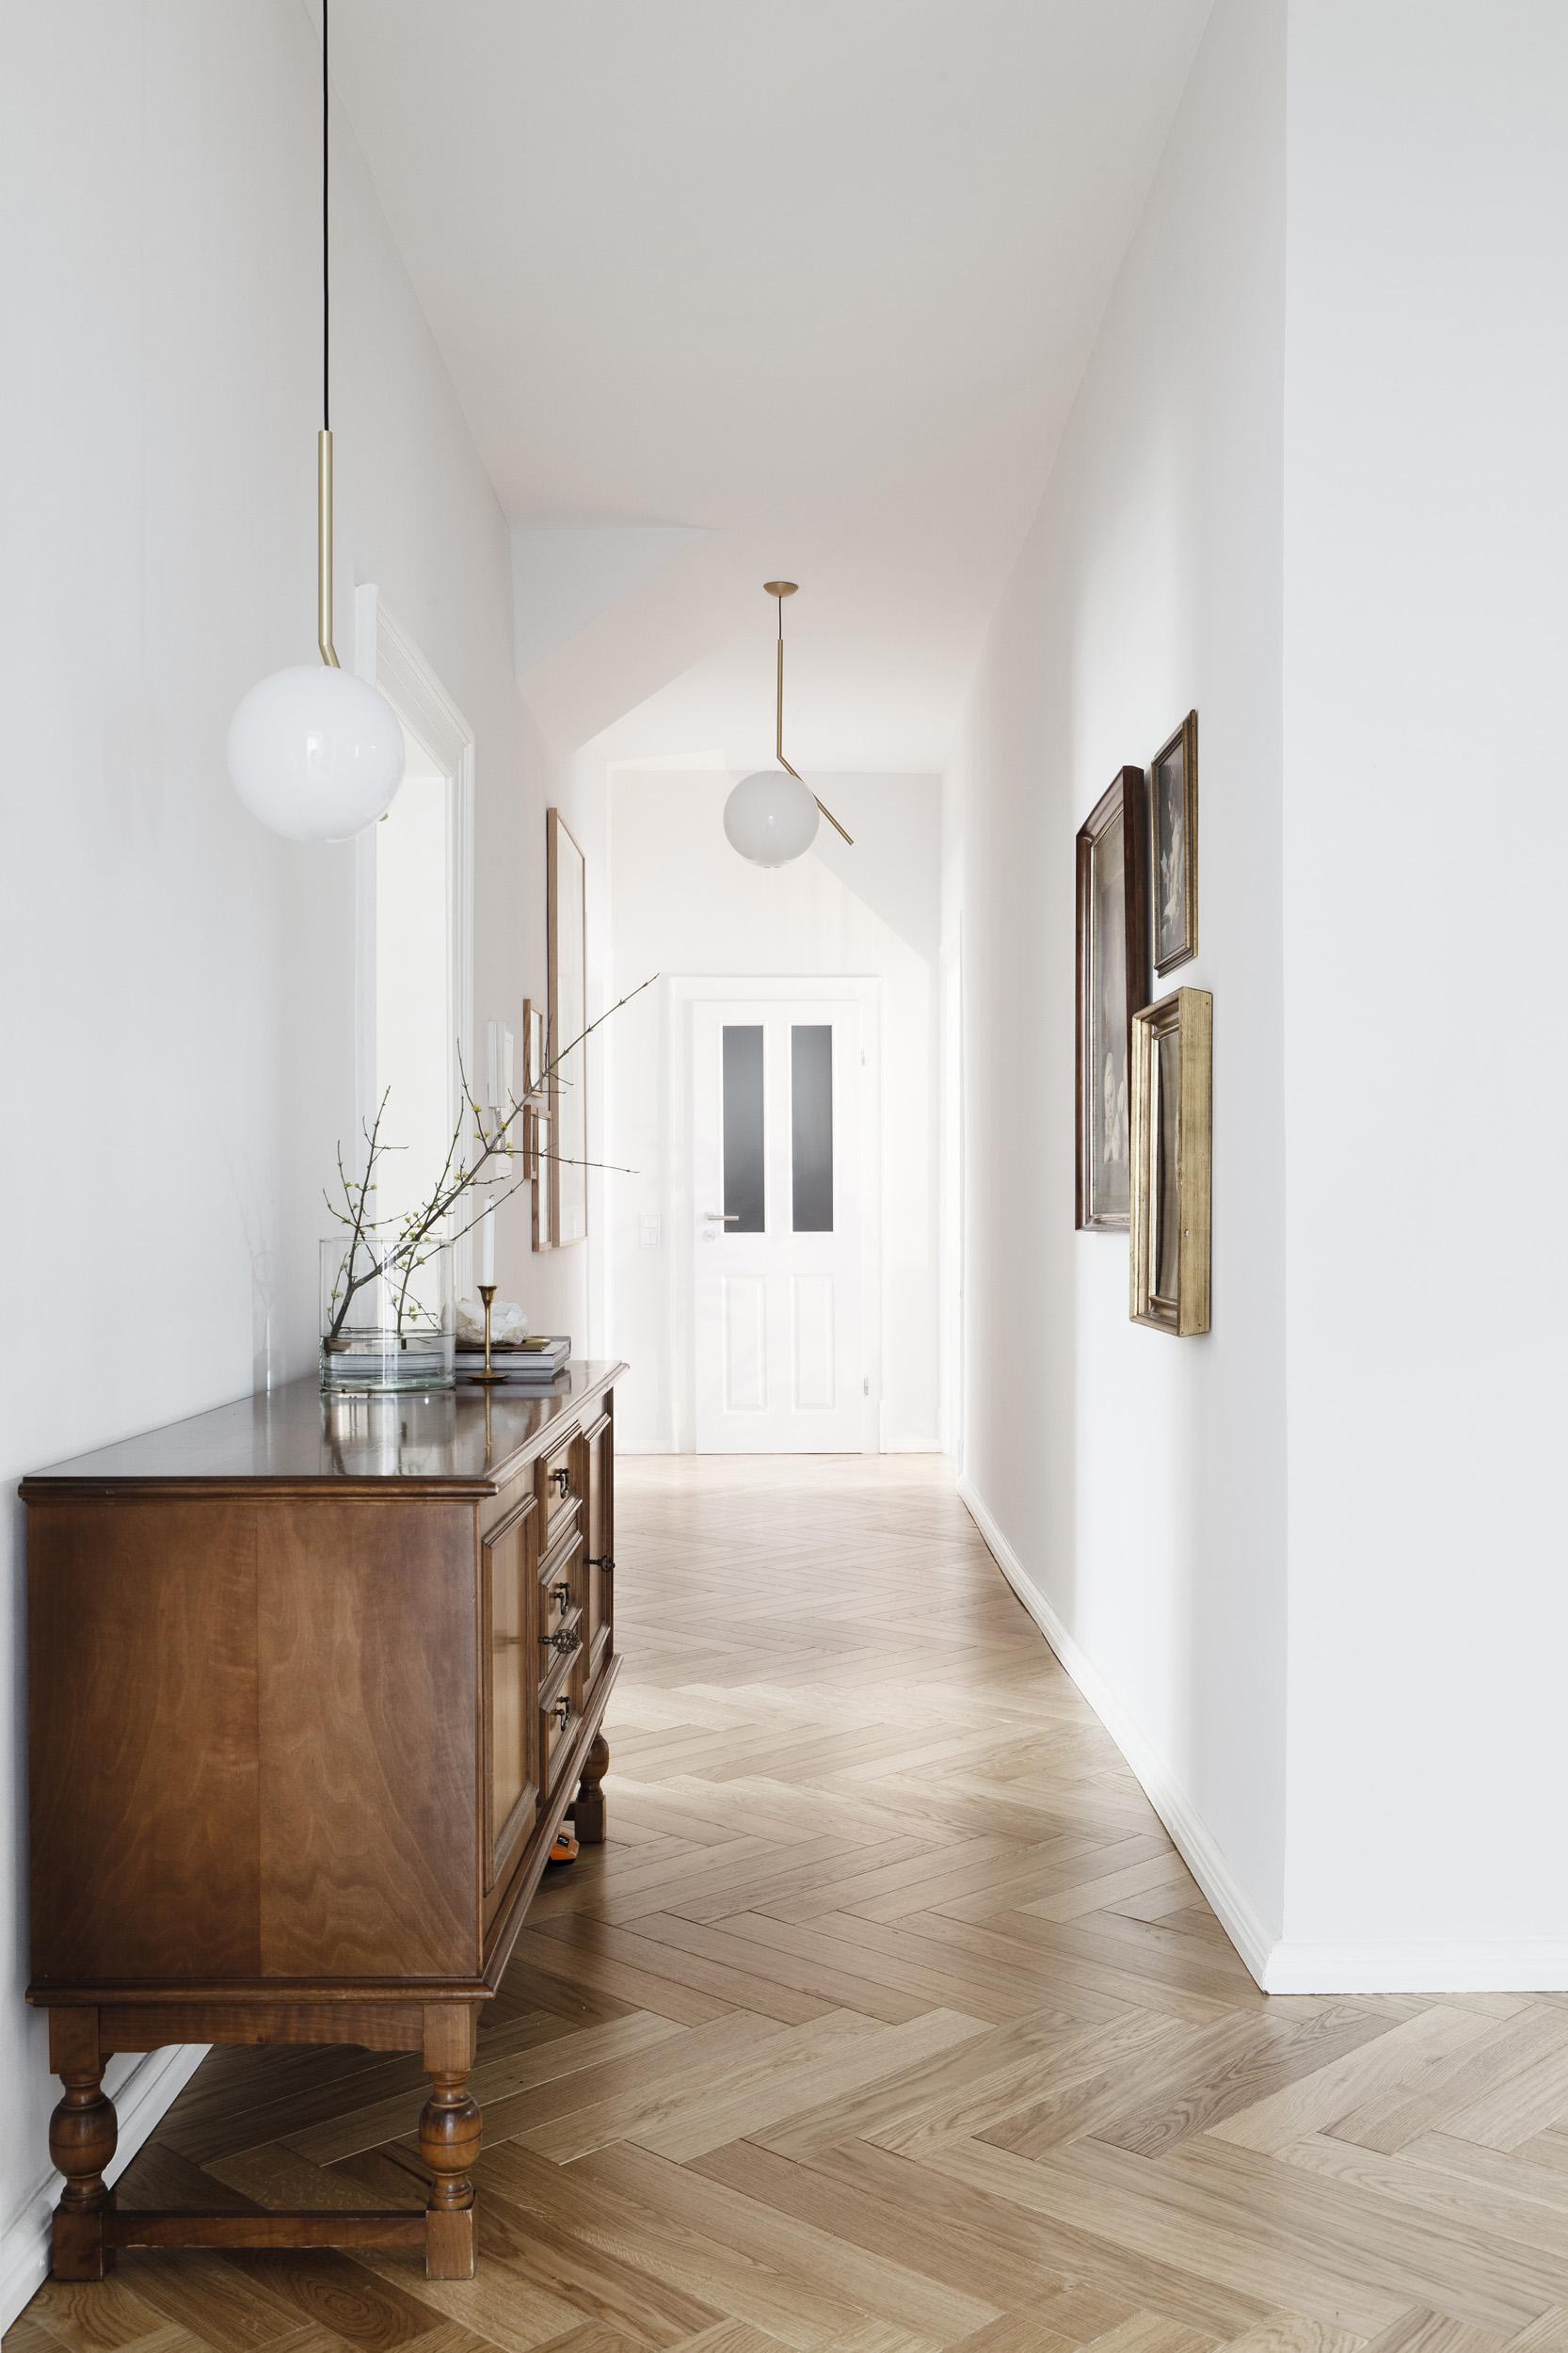 Studio-Oink-House-Cal-II-apartment-remodel-Mainz-Germany-Remodelista-1H.jpg